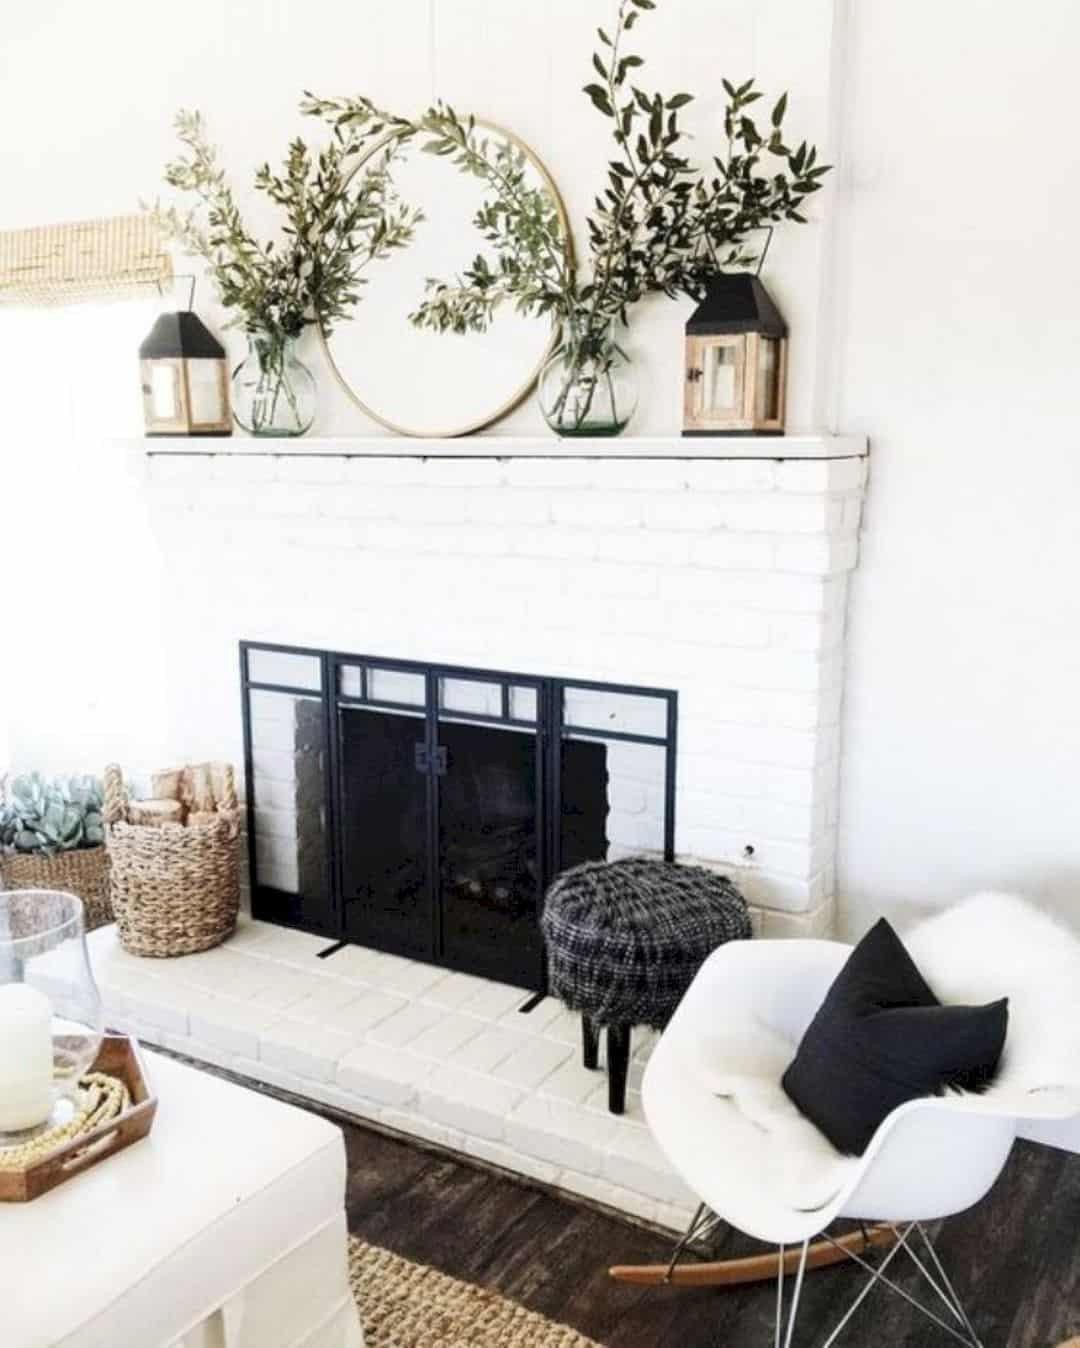 Ideas for Fireplace Mantel Decor Elegant 16 Fireplace Mantel Decorating Ideas